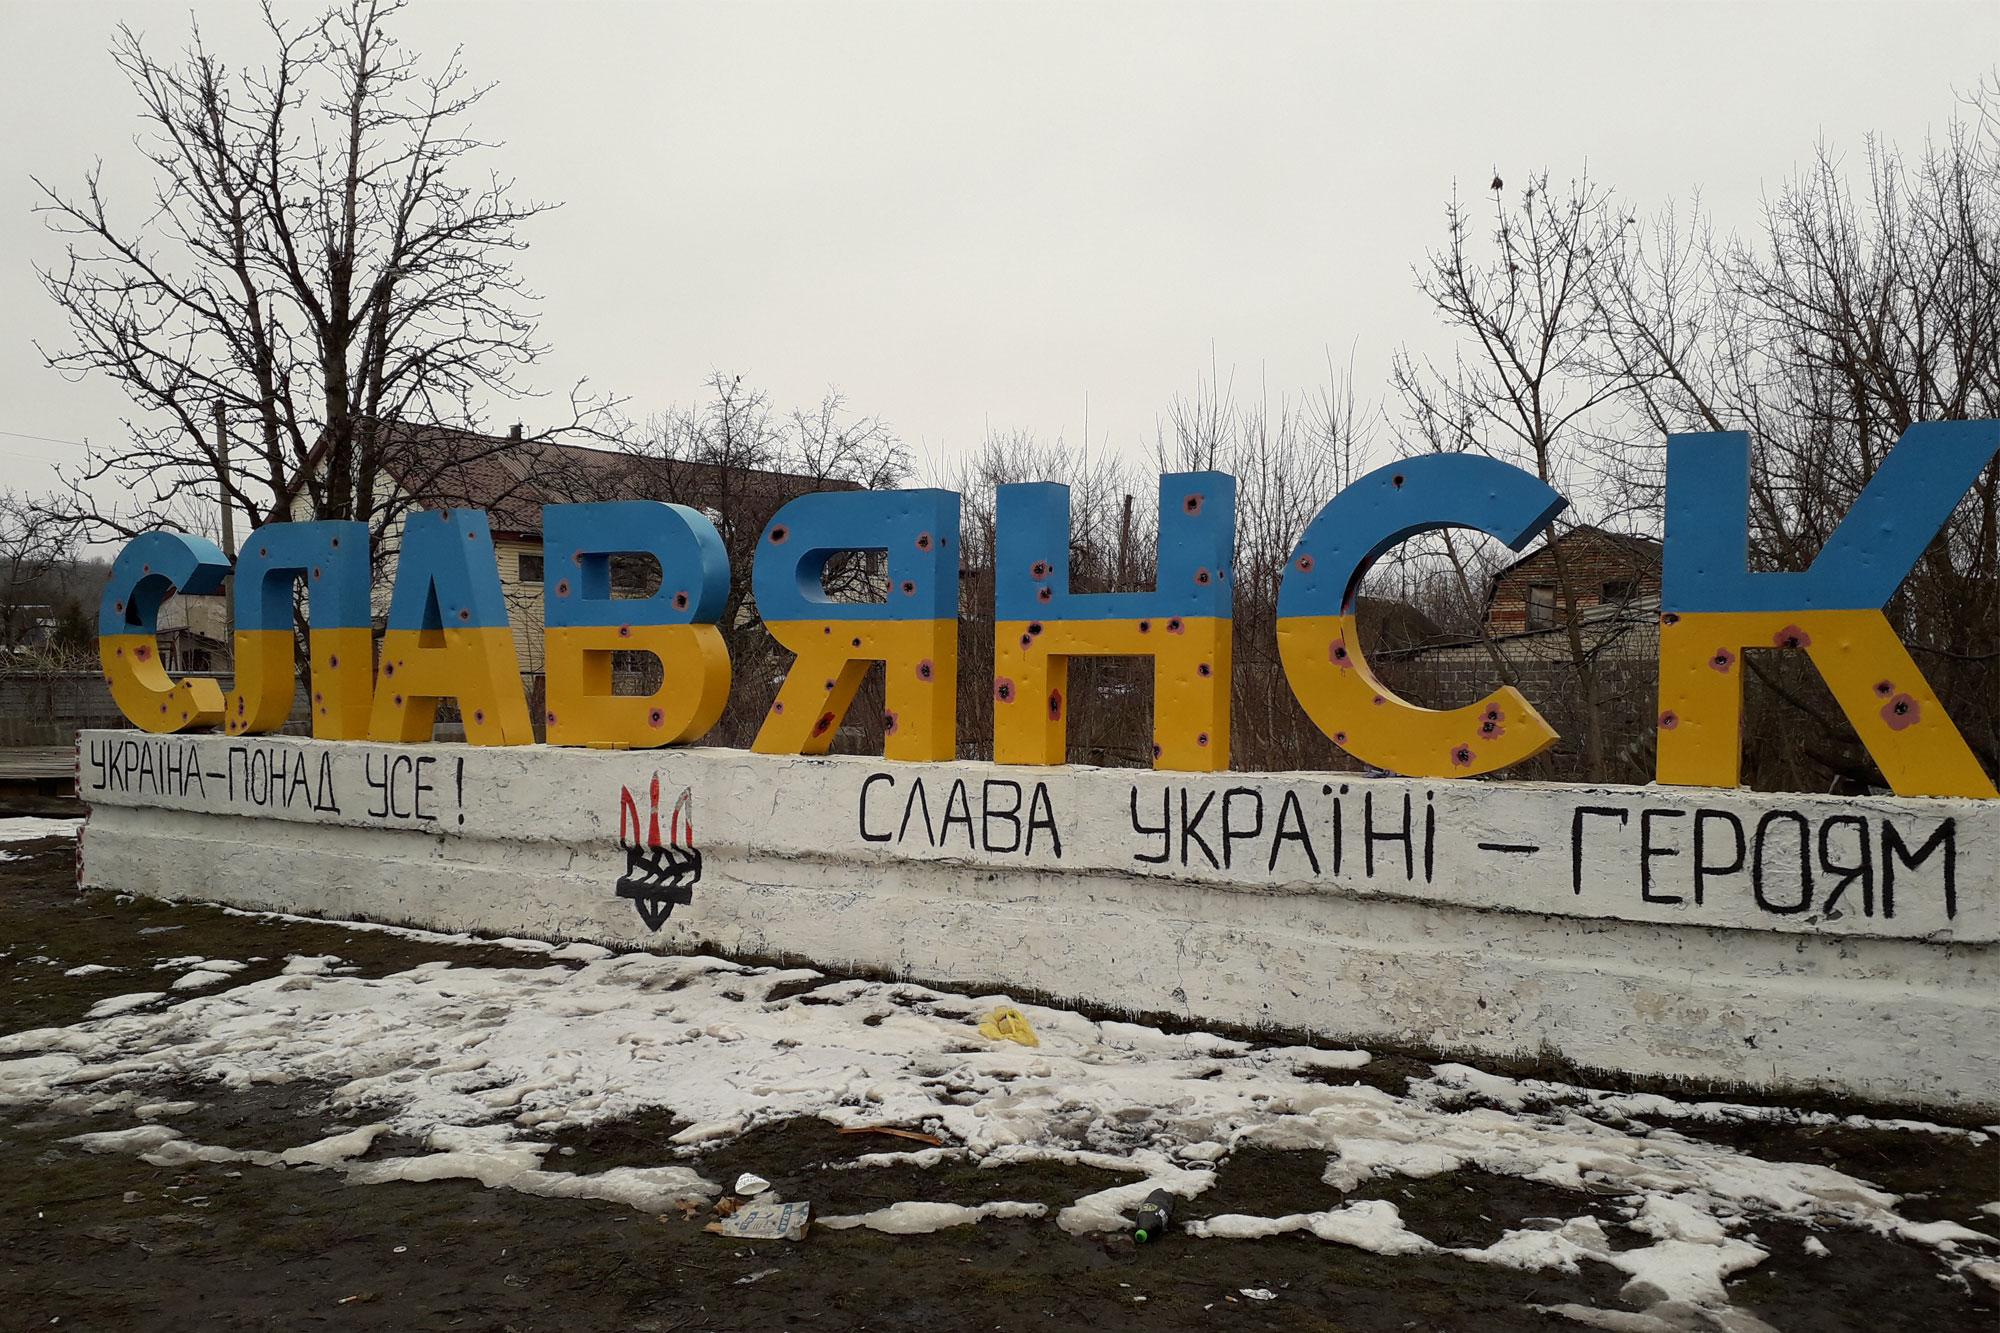 A concrete sign in Ukrainian